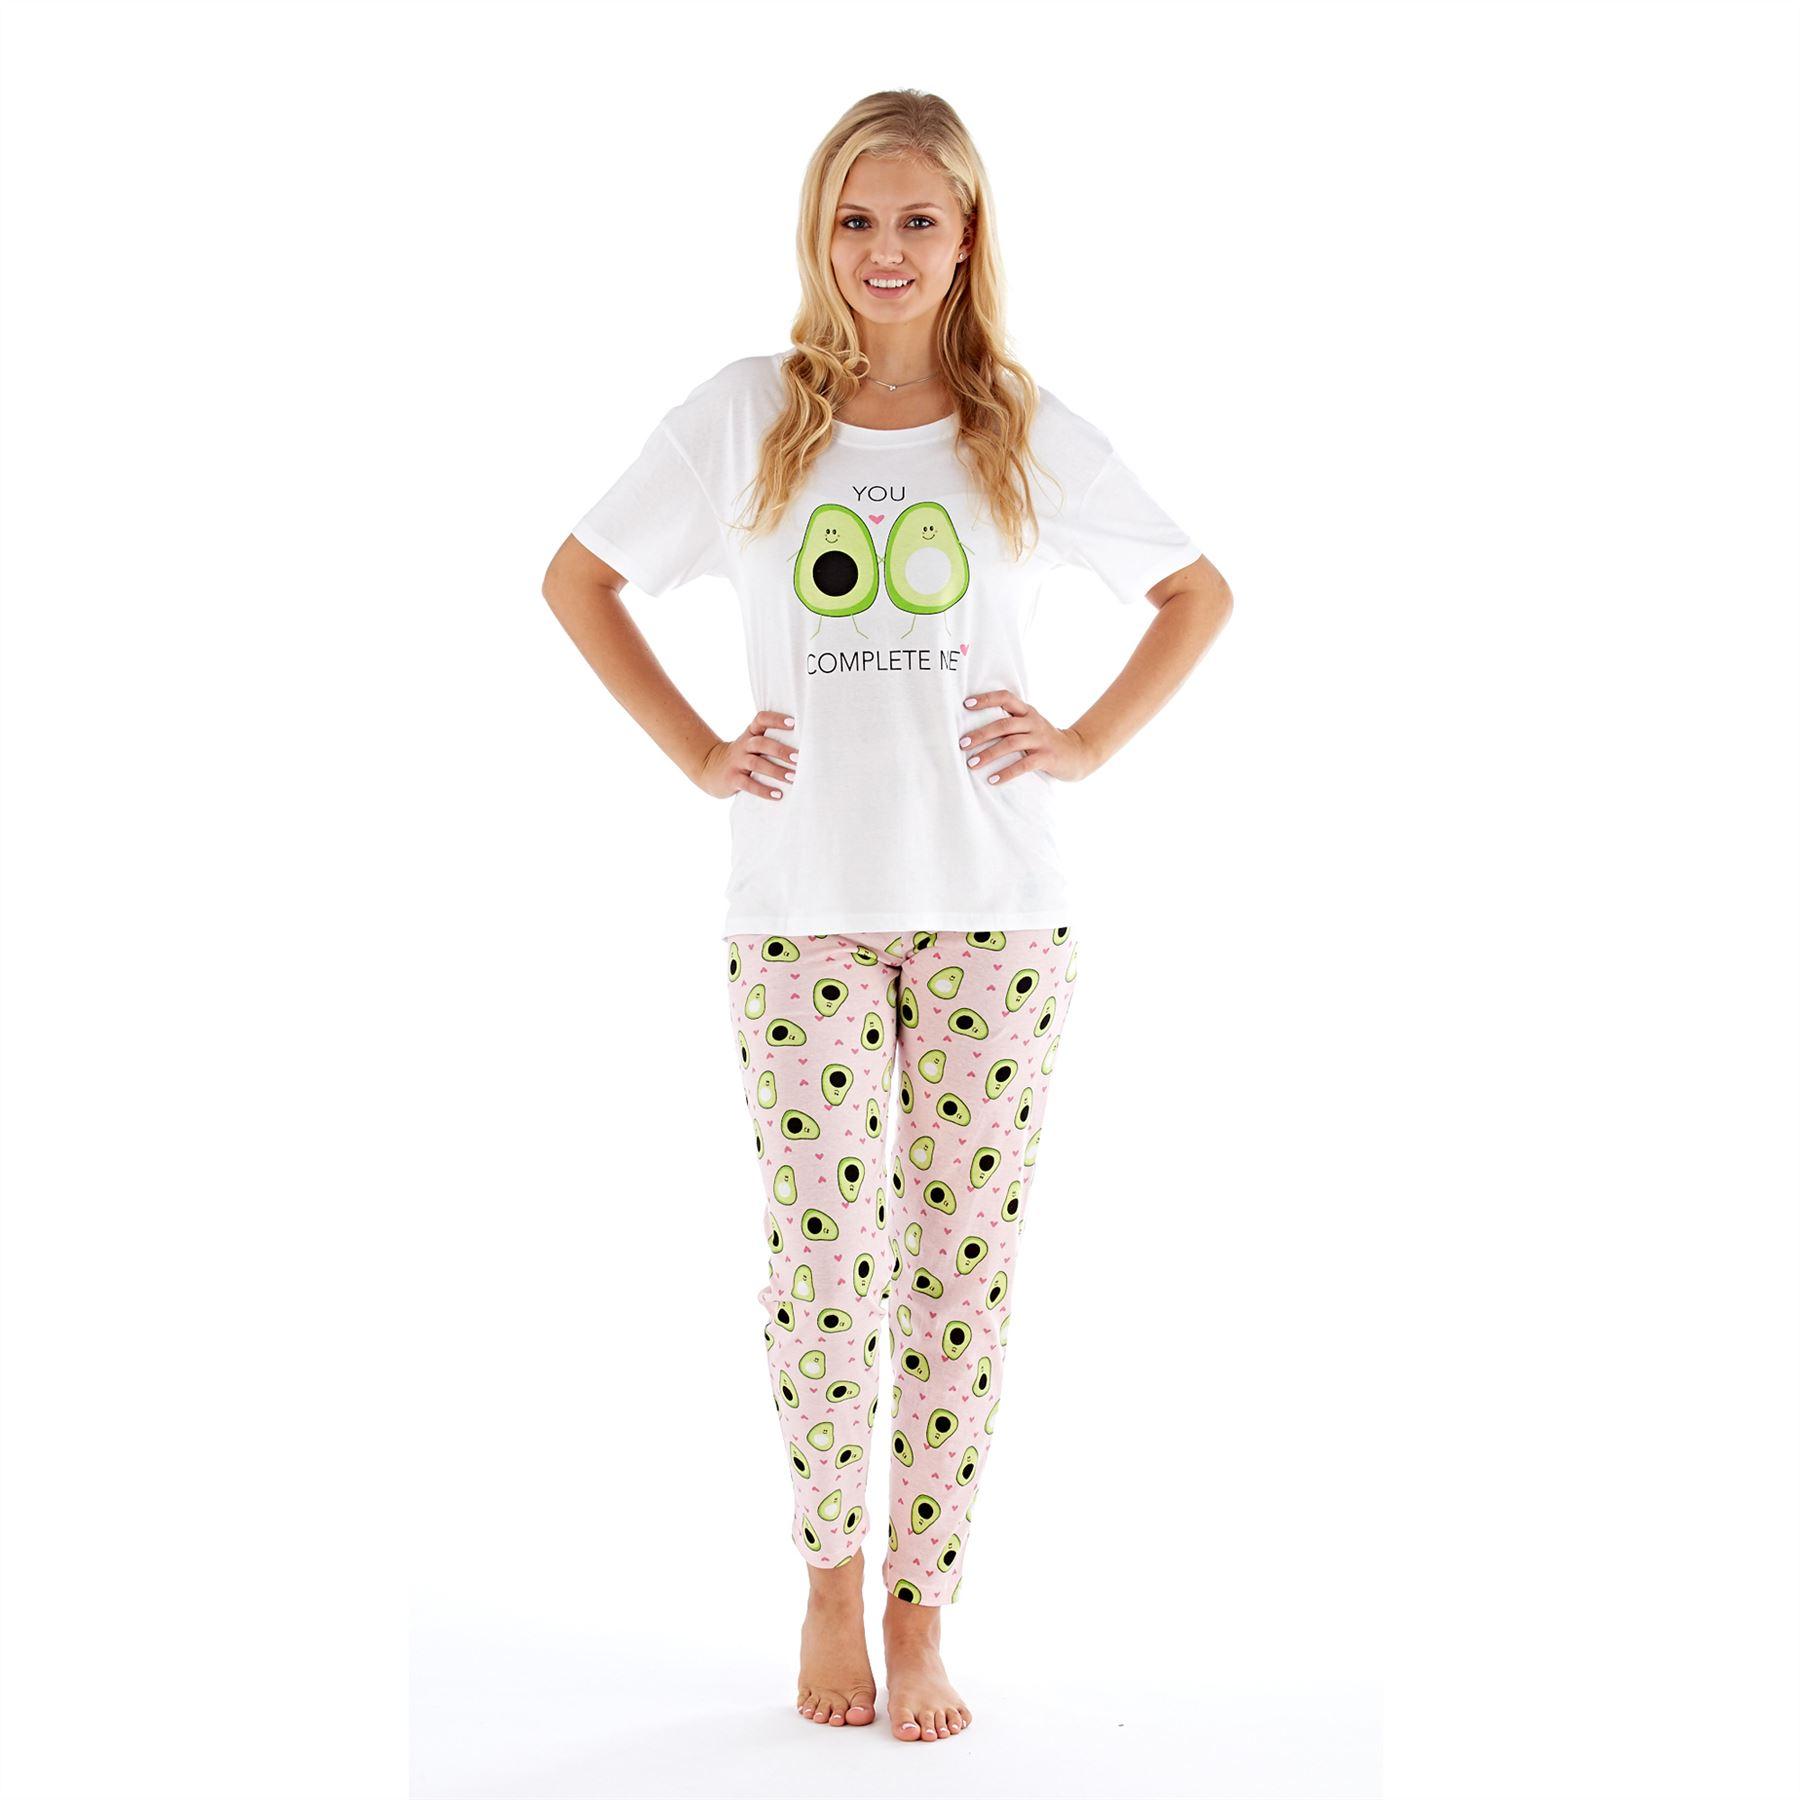 Womens-Ladies-Cotton-Pyjamas-Pyjama-PJs-Summer-Nightwear-Set-Size-8-18-NEW thumbnail 5